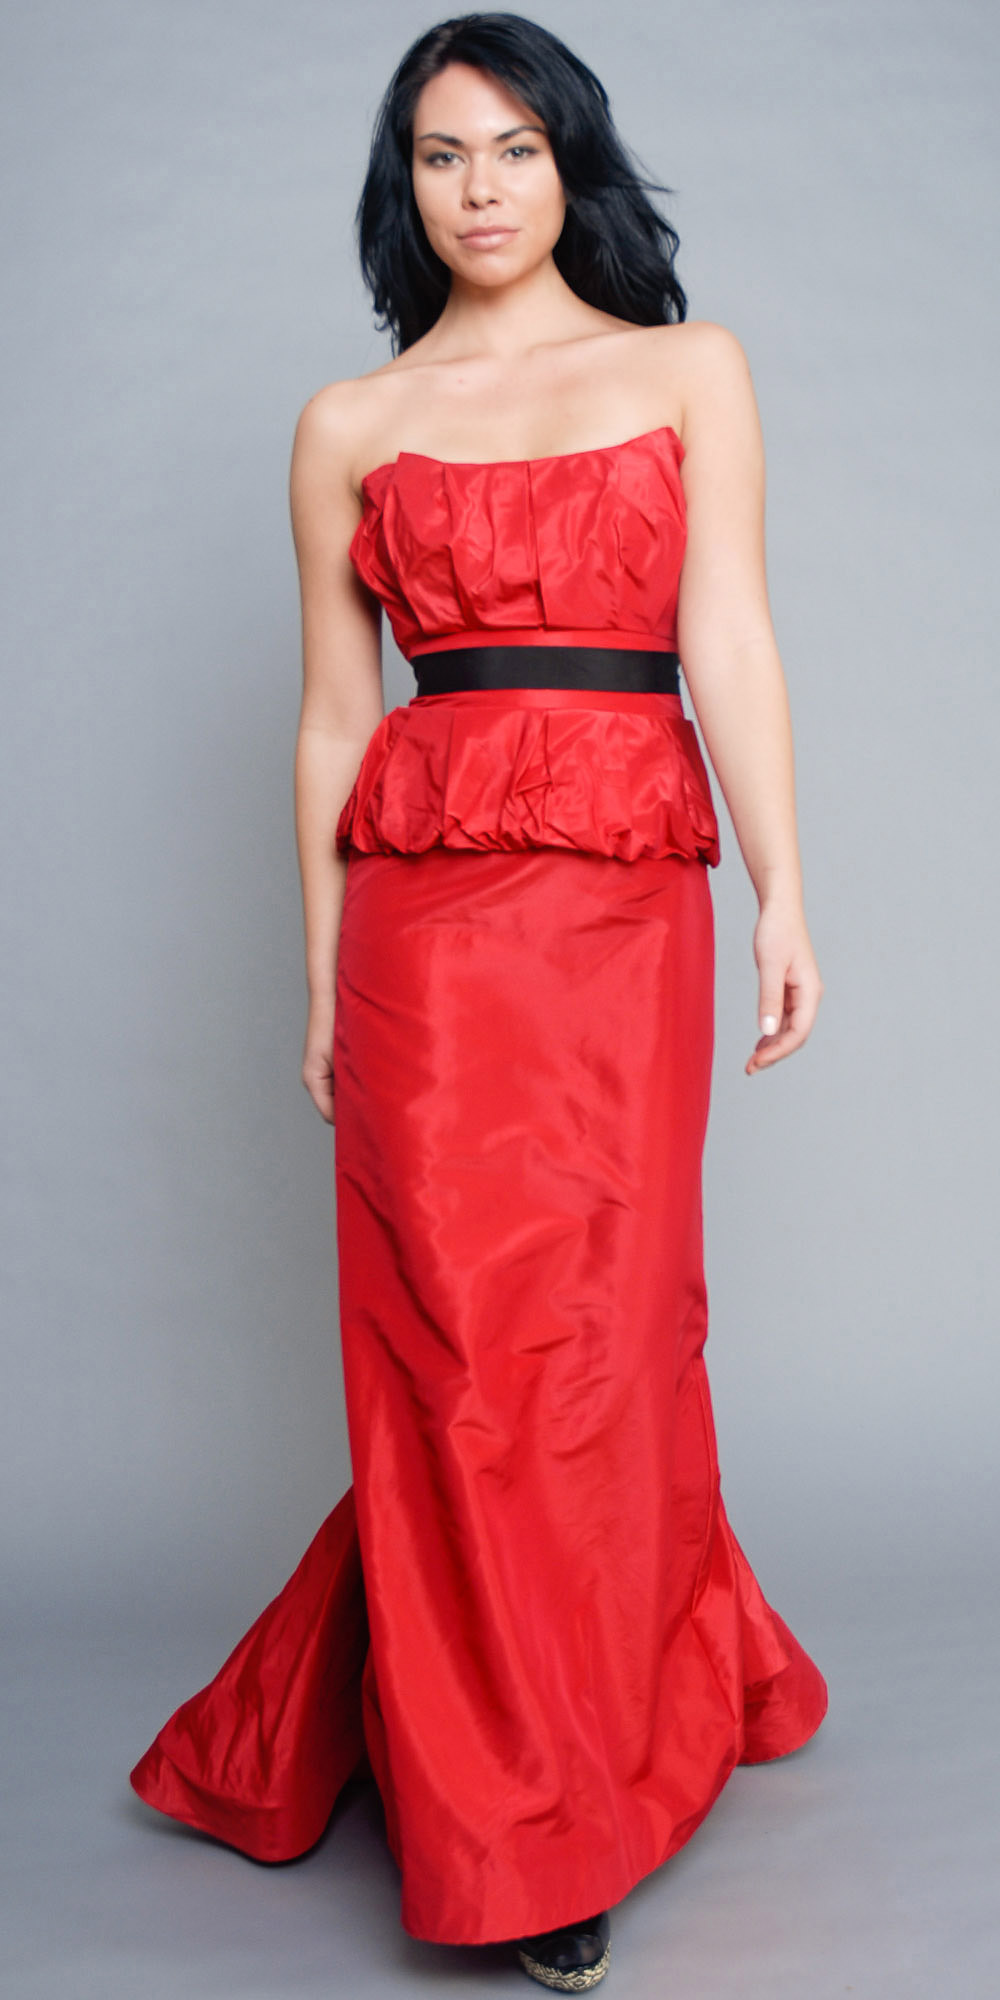 eDressit - Formal Evening Dresses, Prom Dresses & Wedding ...